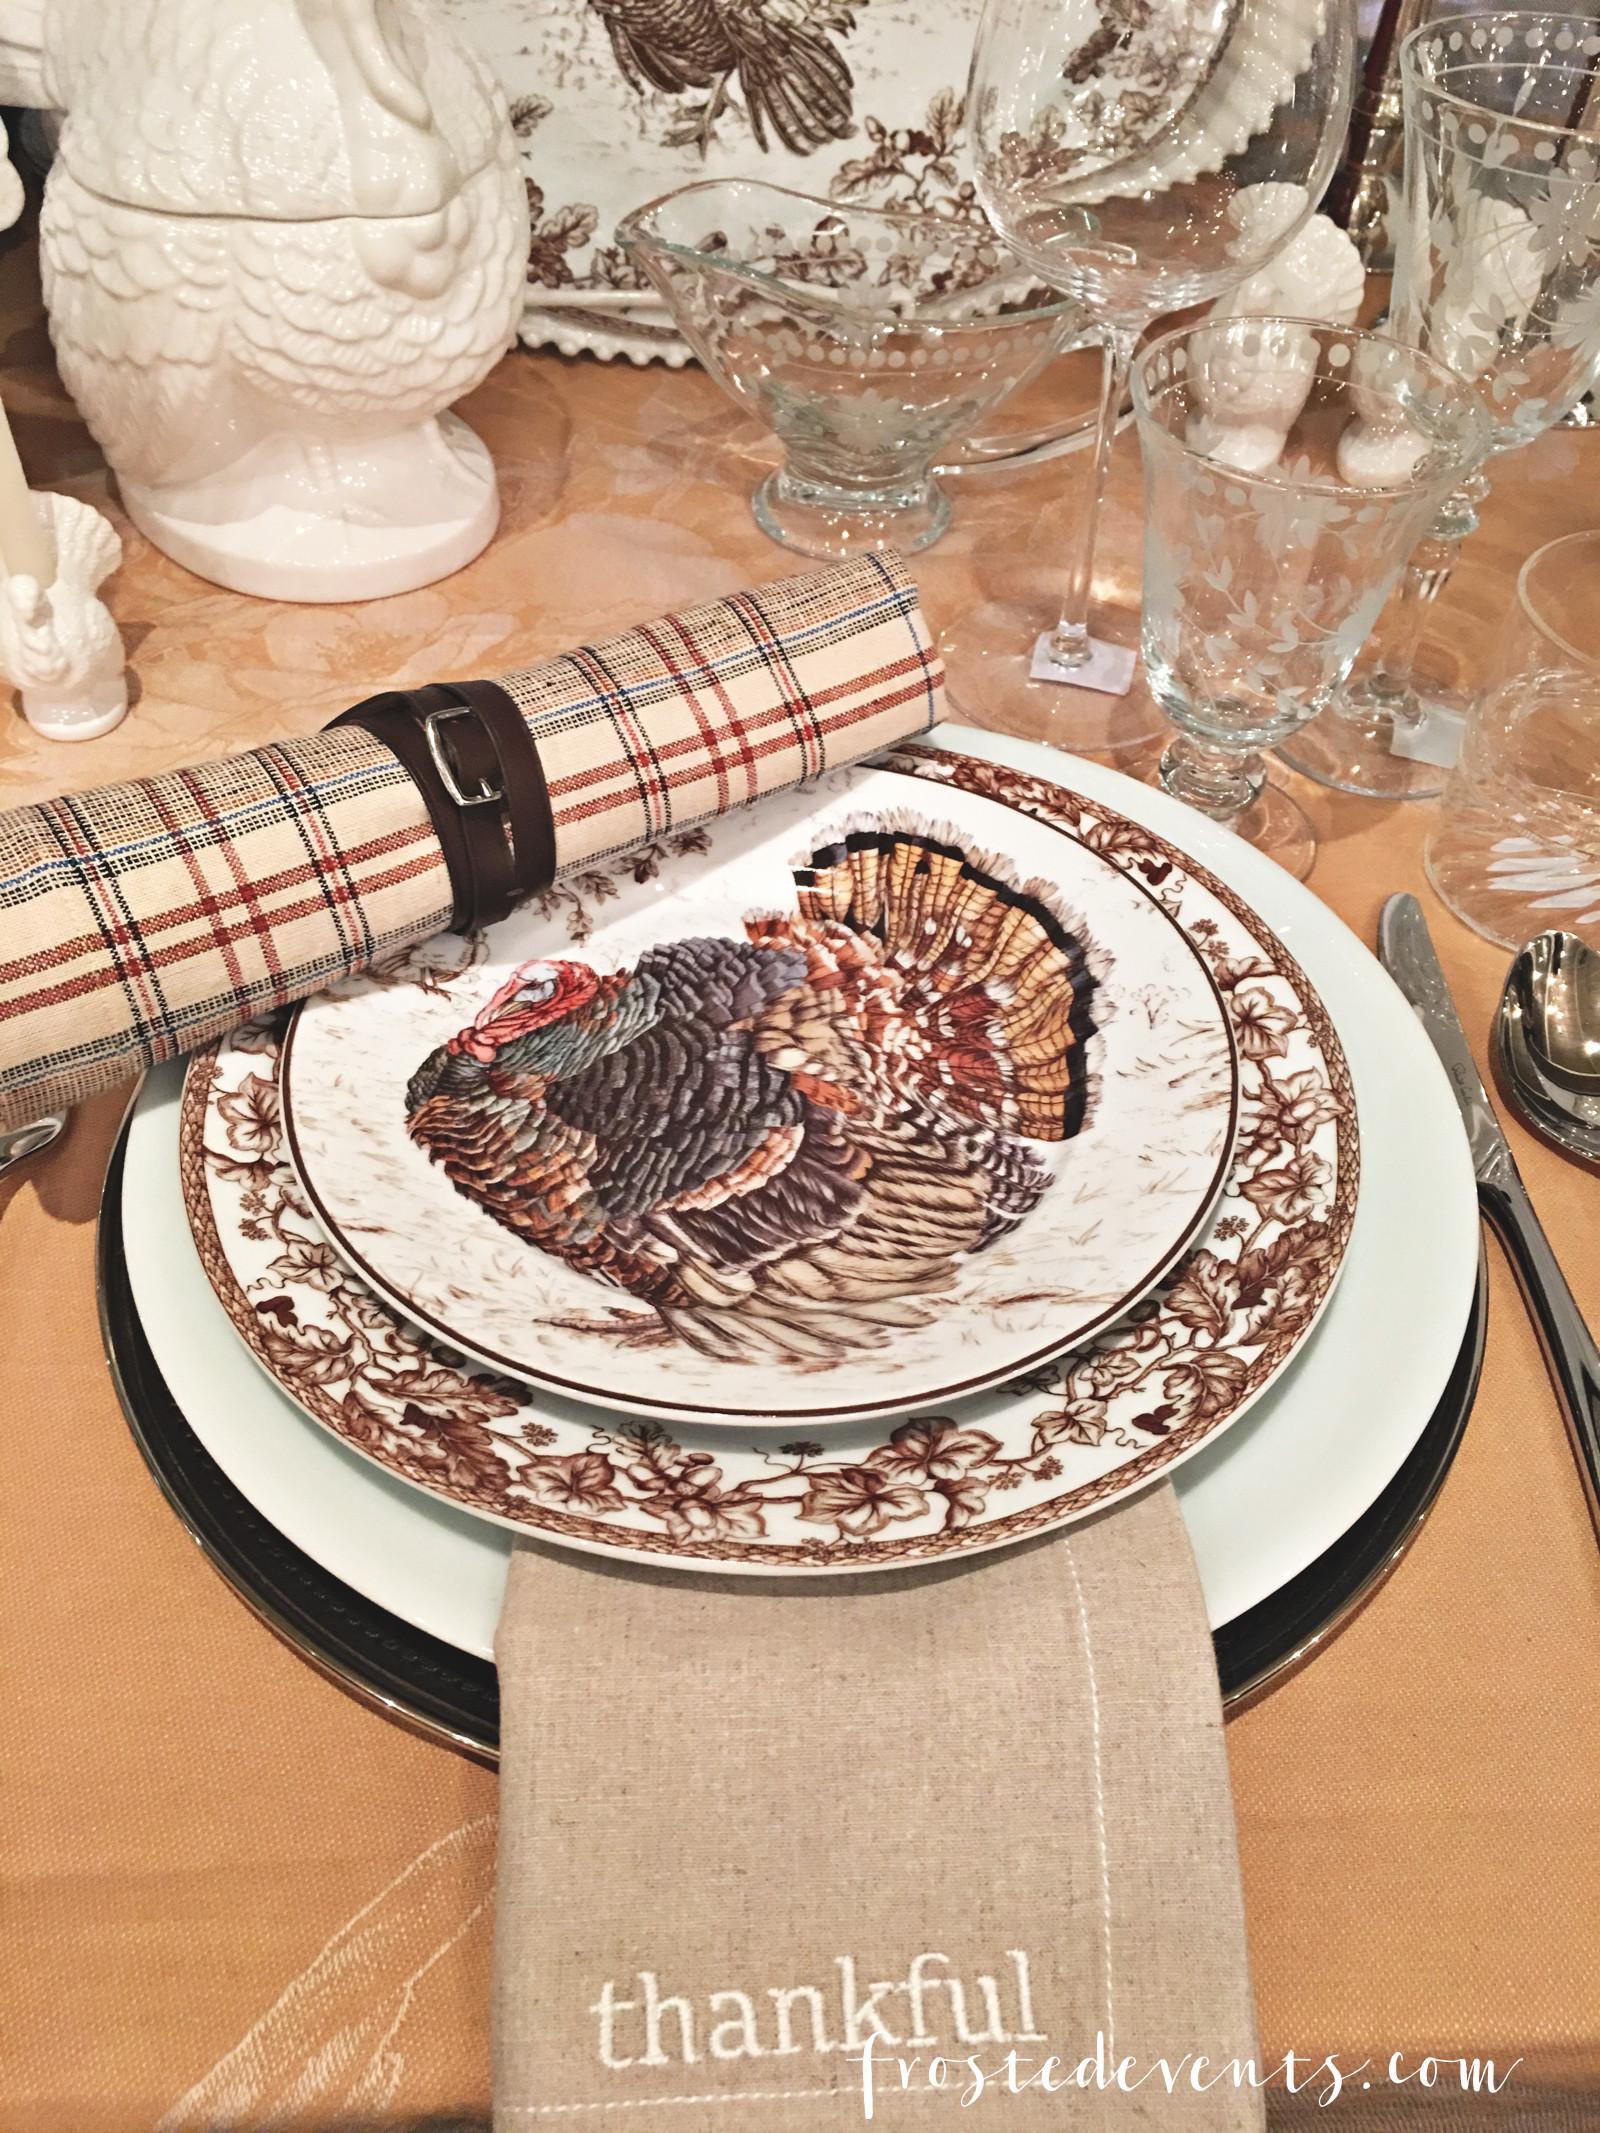 Publix Thanksgiving Dinner 2018  thanksgiving dinner whole foods order williams sonoma